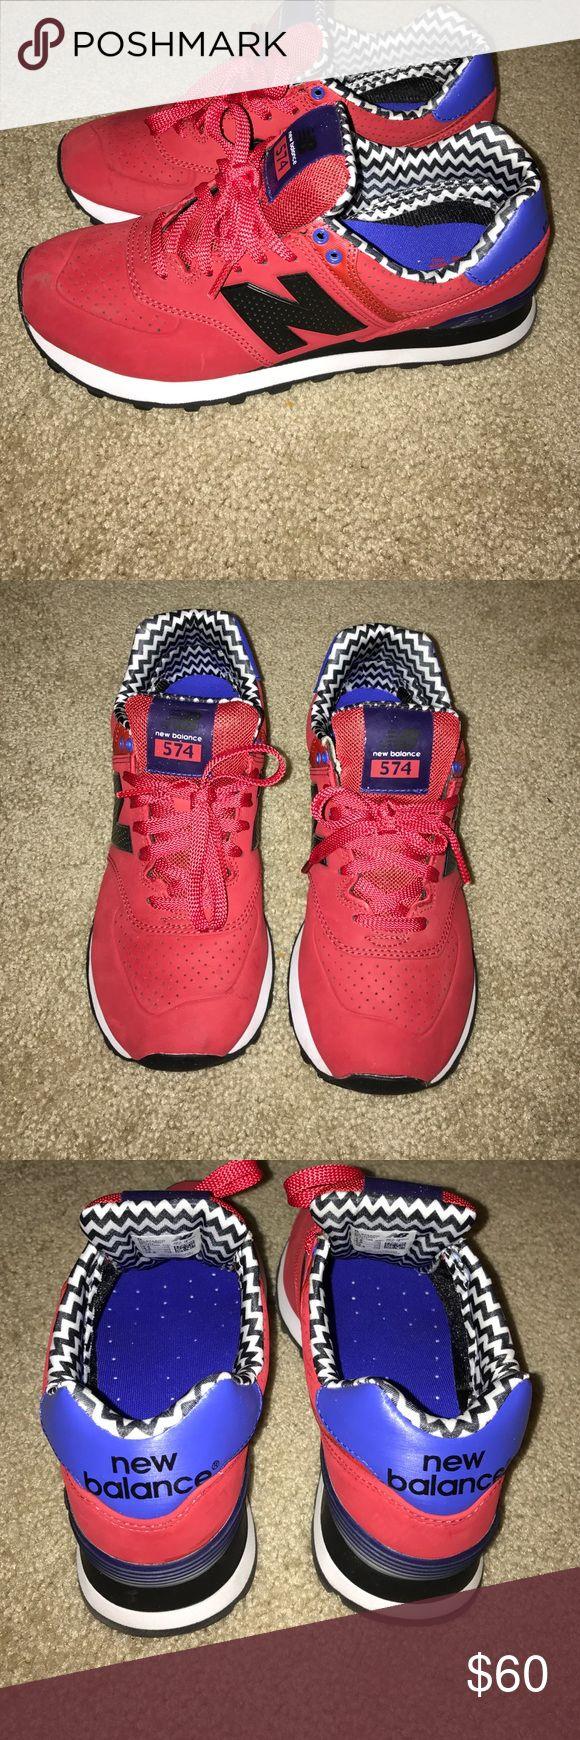 New balance 574 red w/black & white New balance 574 red w/black & white New Balance Shoes Sneakers